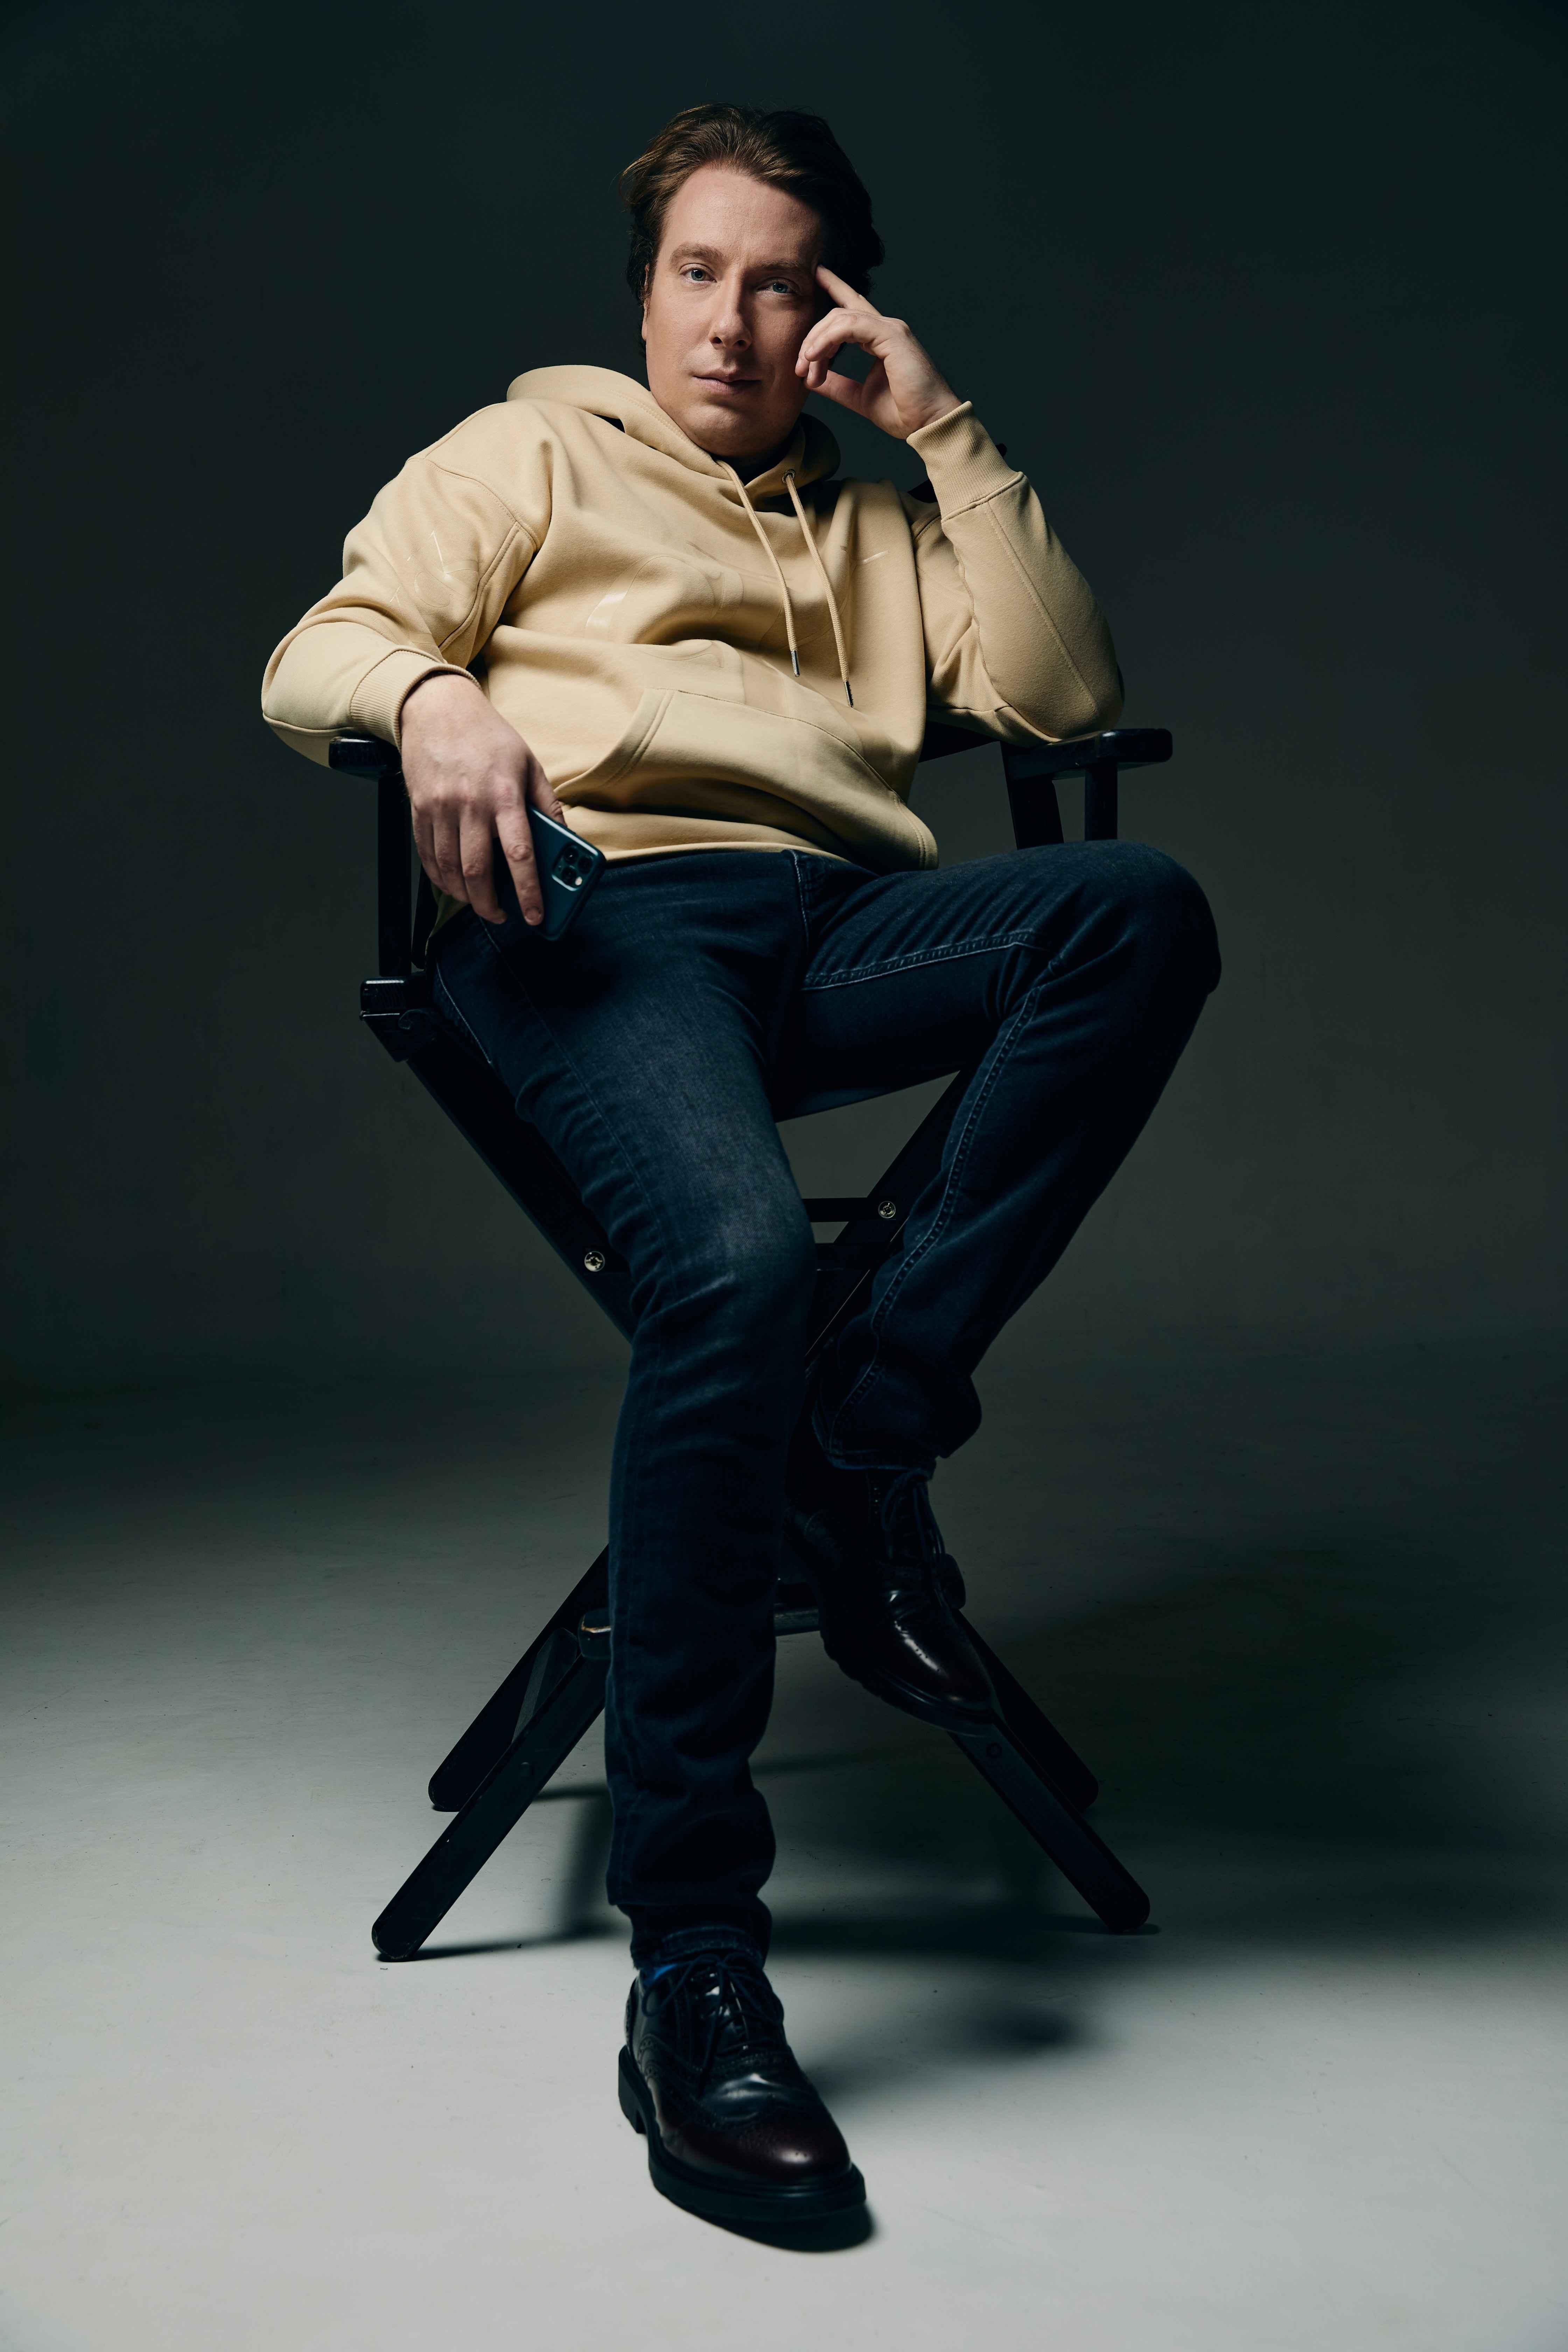 Boris Pinkhasovich - Picture nr #30